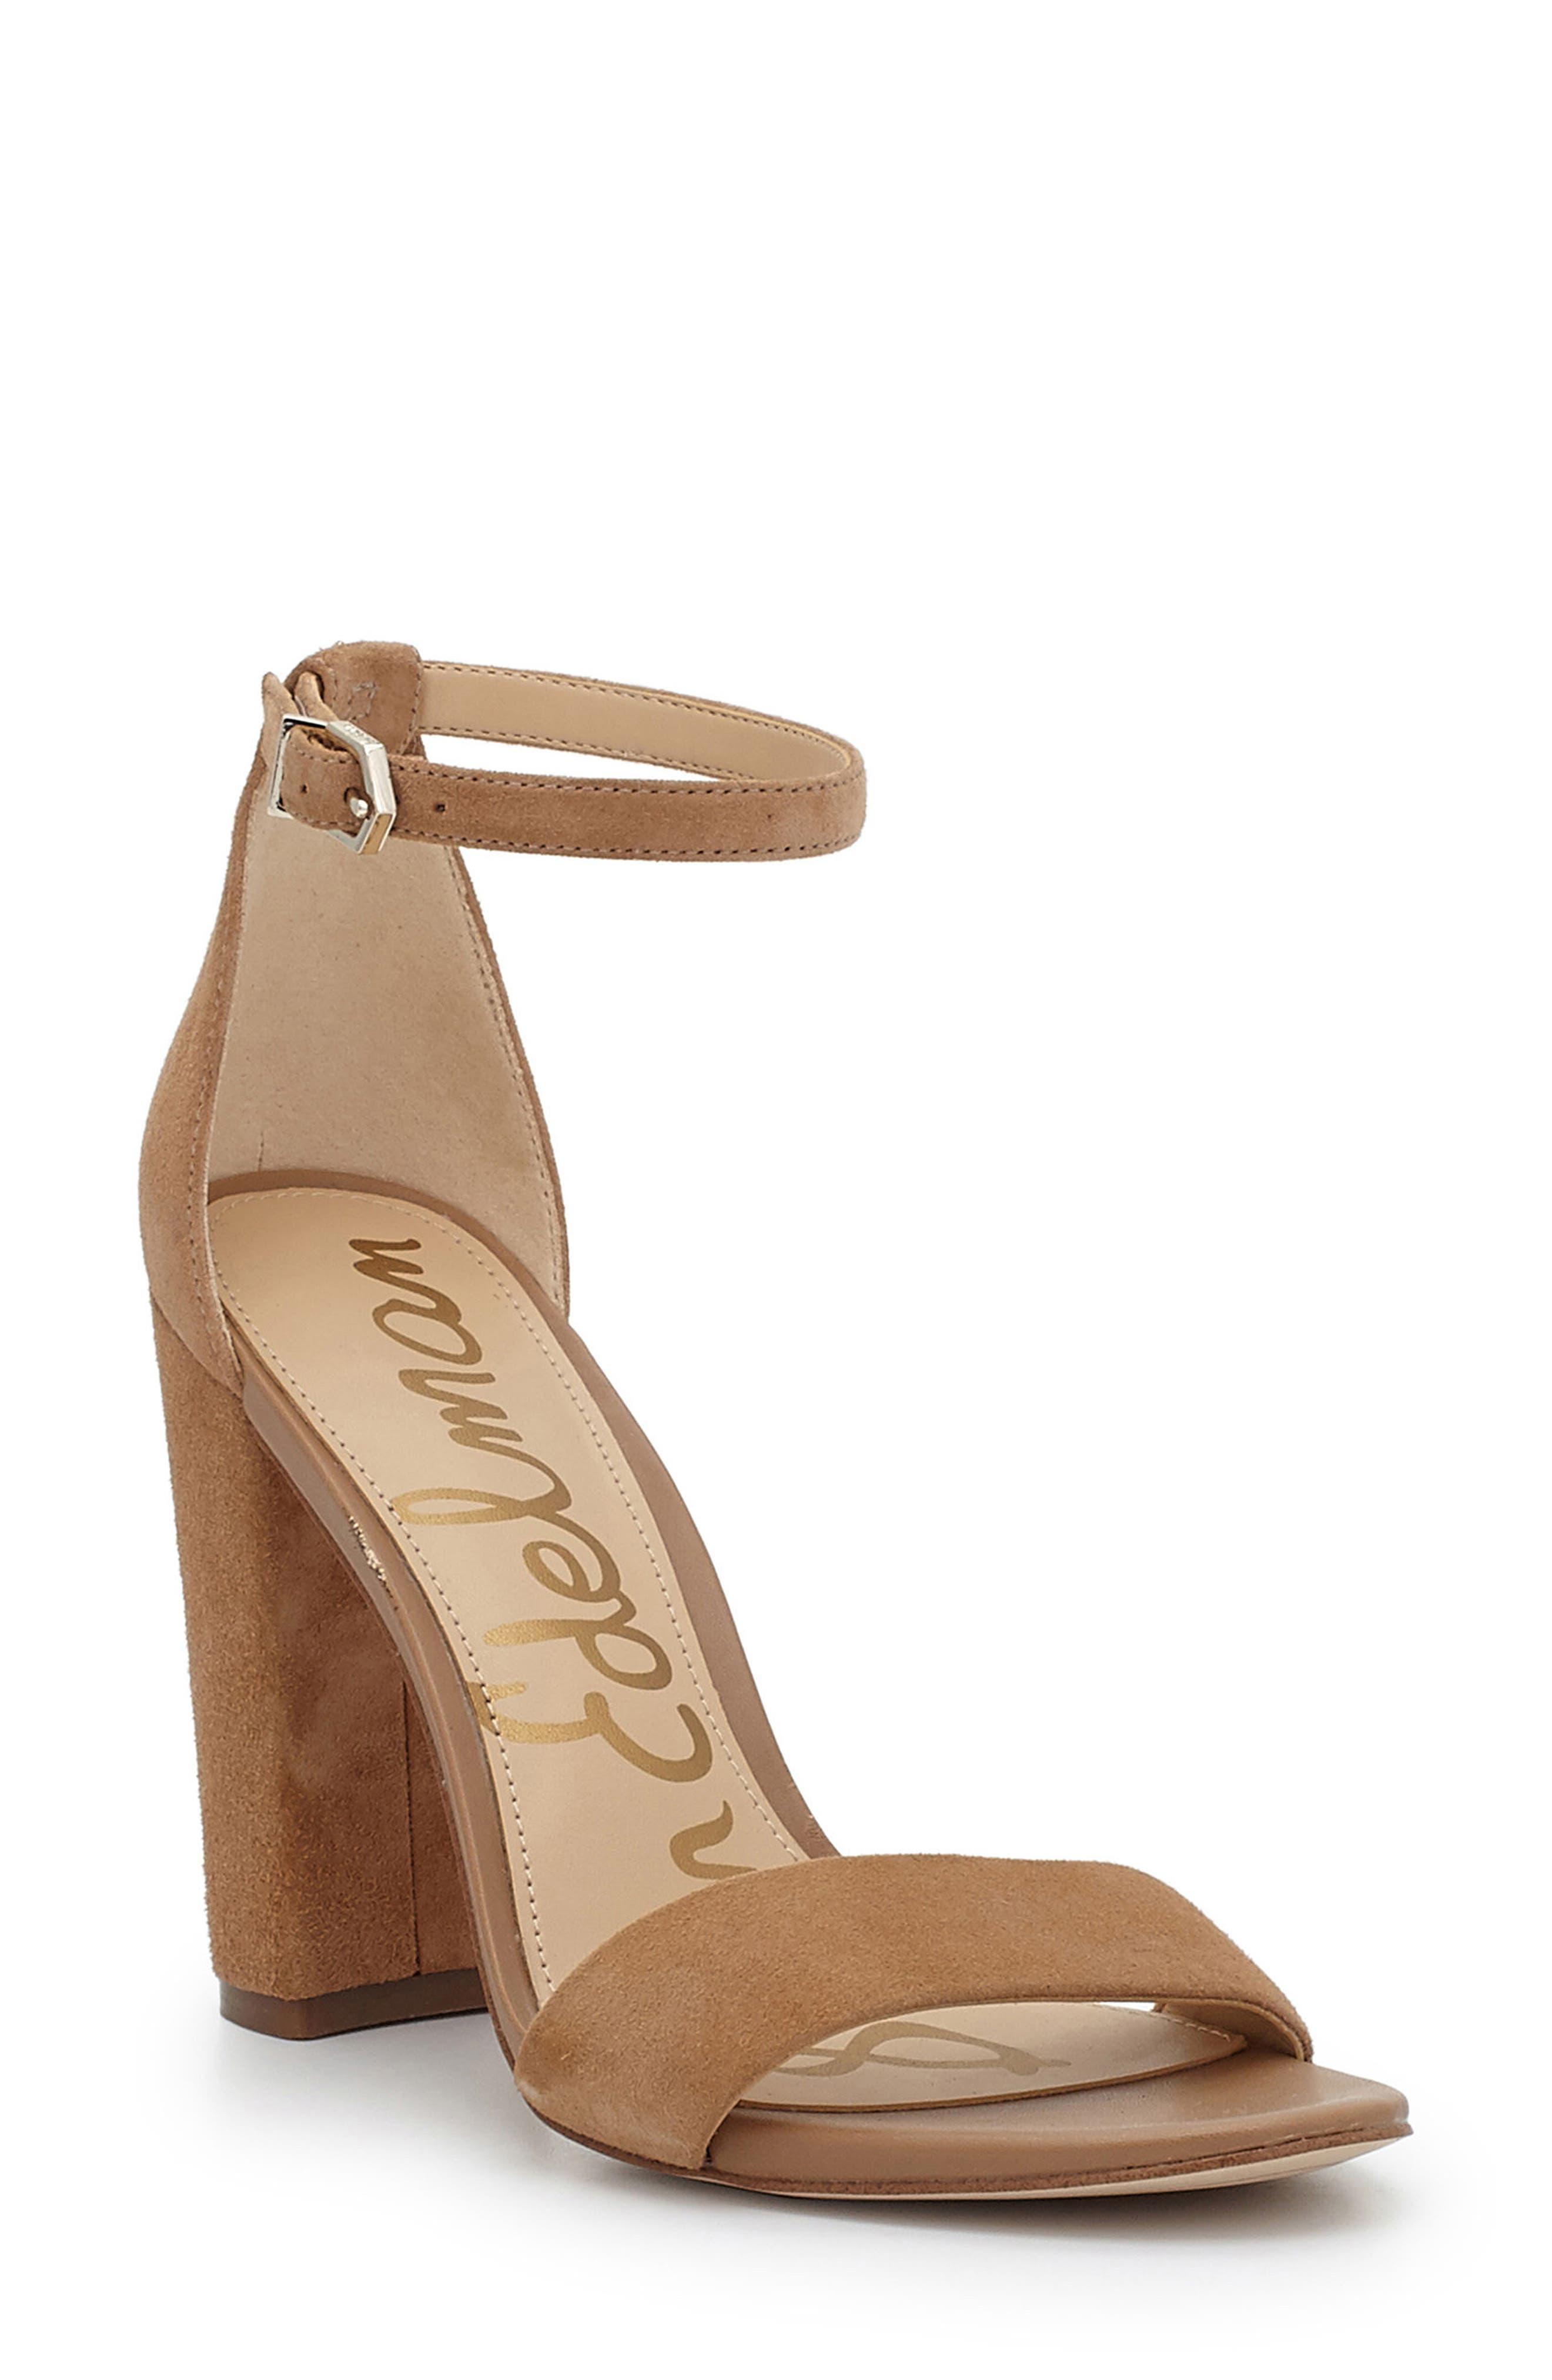 SAM EDELMAN Yaro Ankle Strap Sandal, Golden Caramel Suede